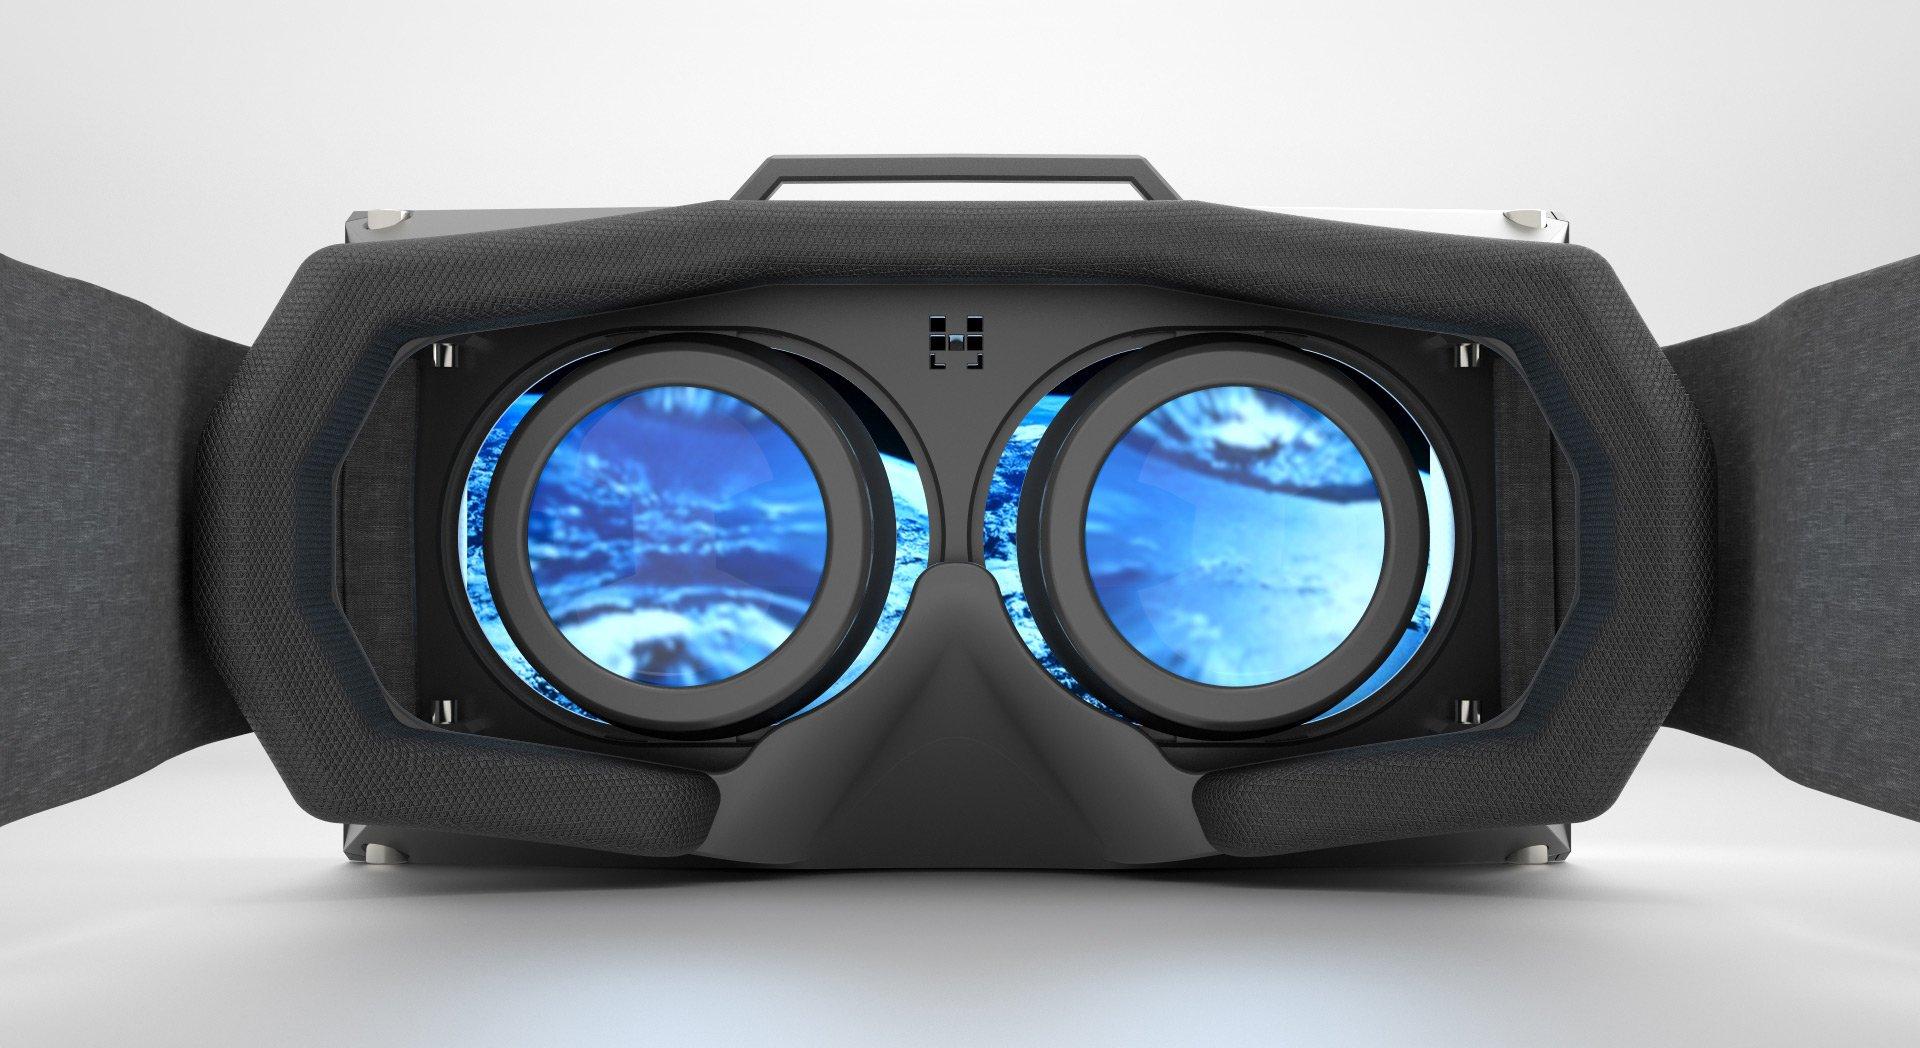 Oculus-Rift-5-million-sales-Feature-Image